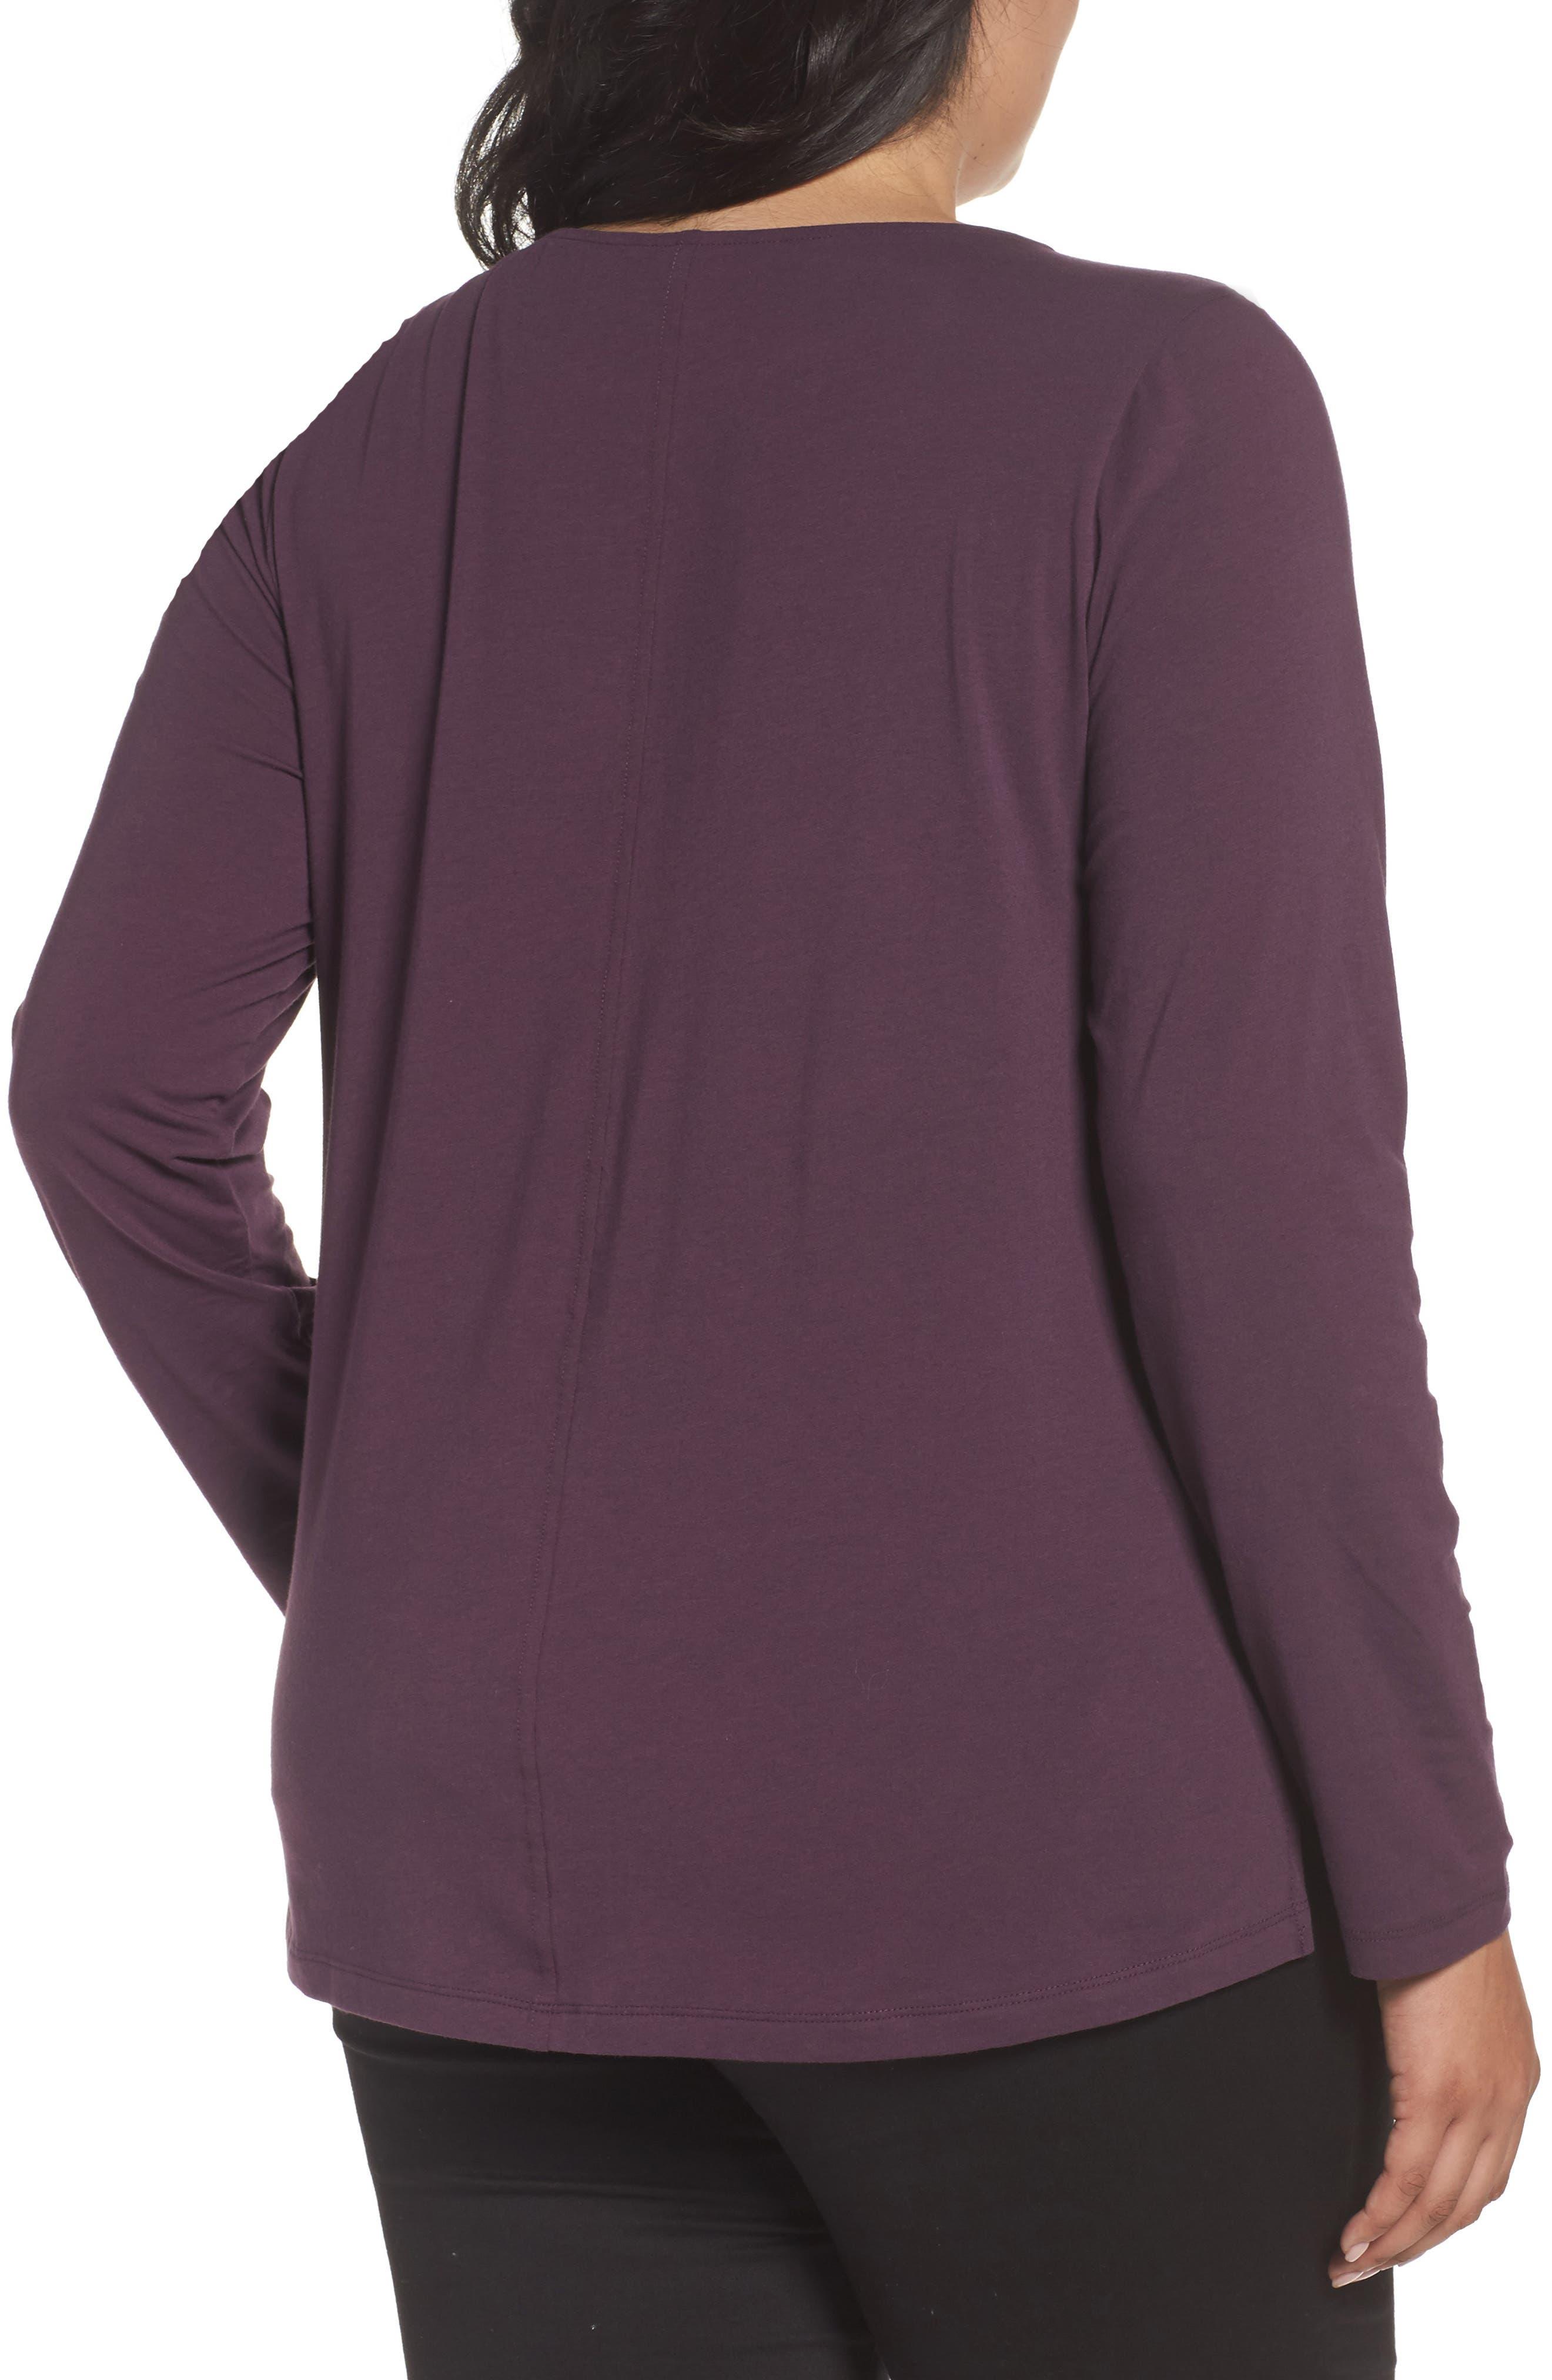 Ballet Neck Long Sleeve Tee,                             Alternate thumbnail 2, color,                             Purple Plum